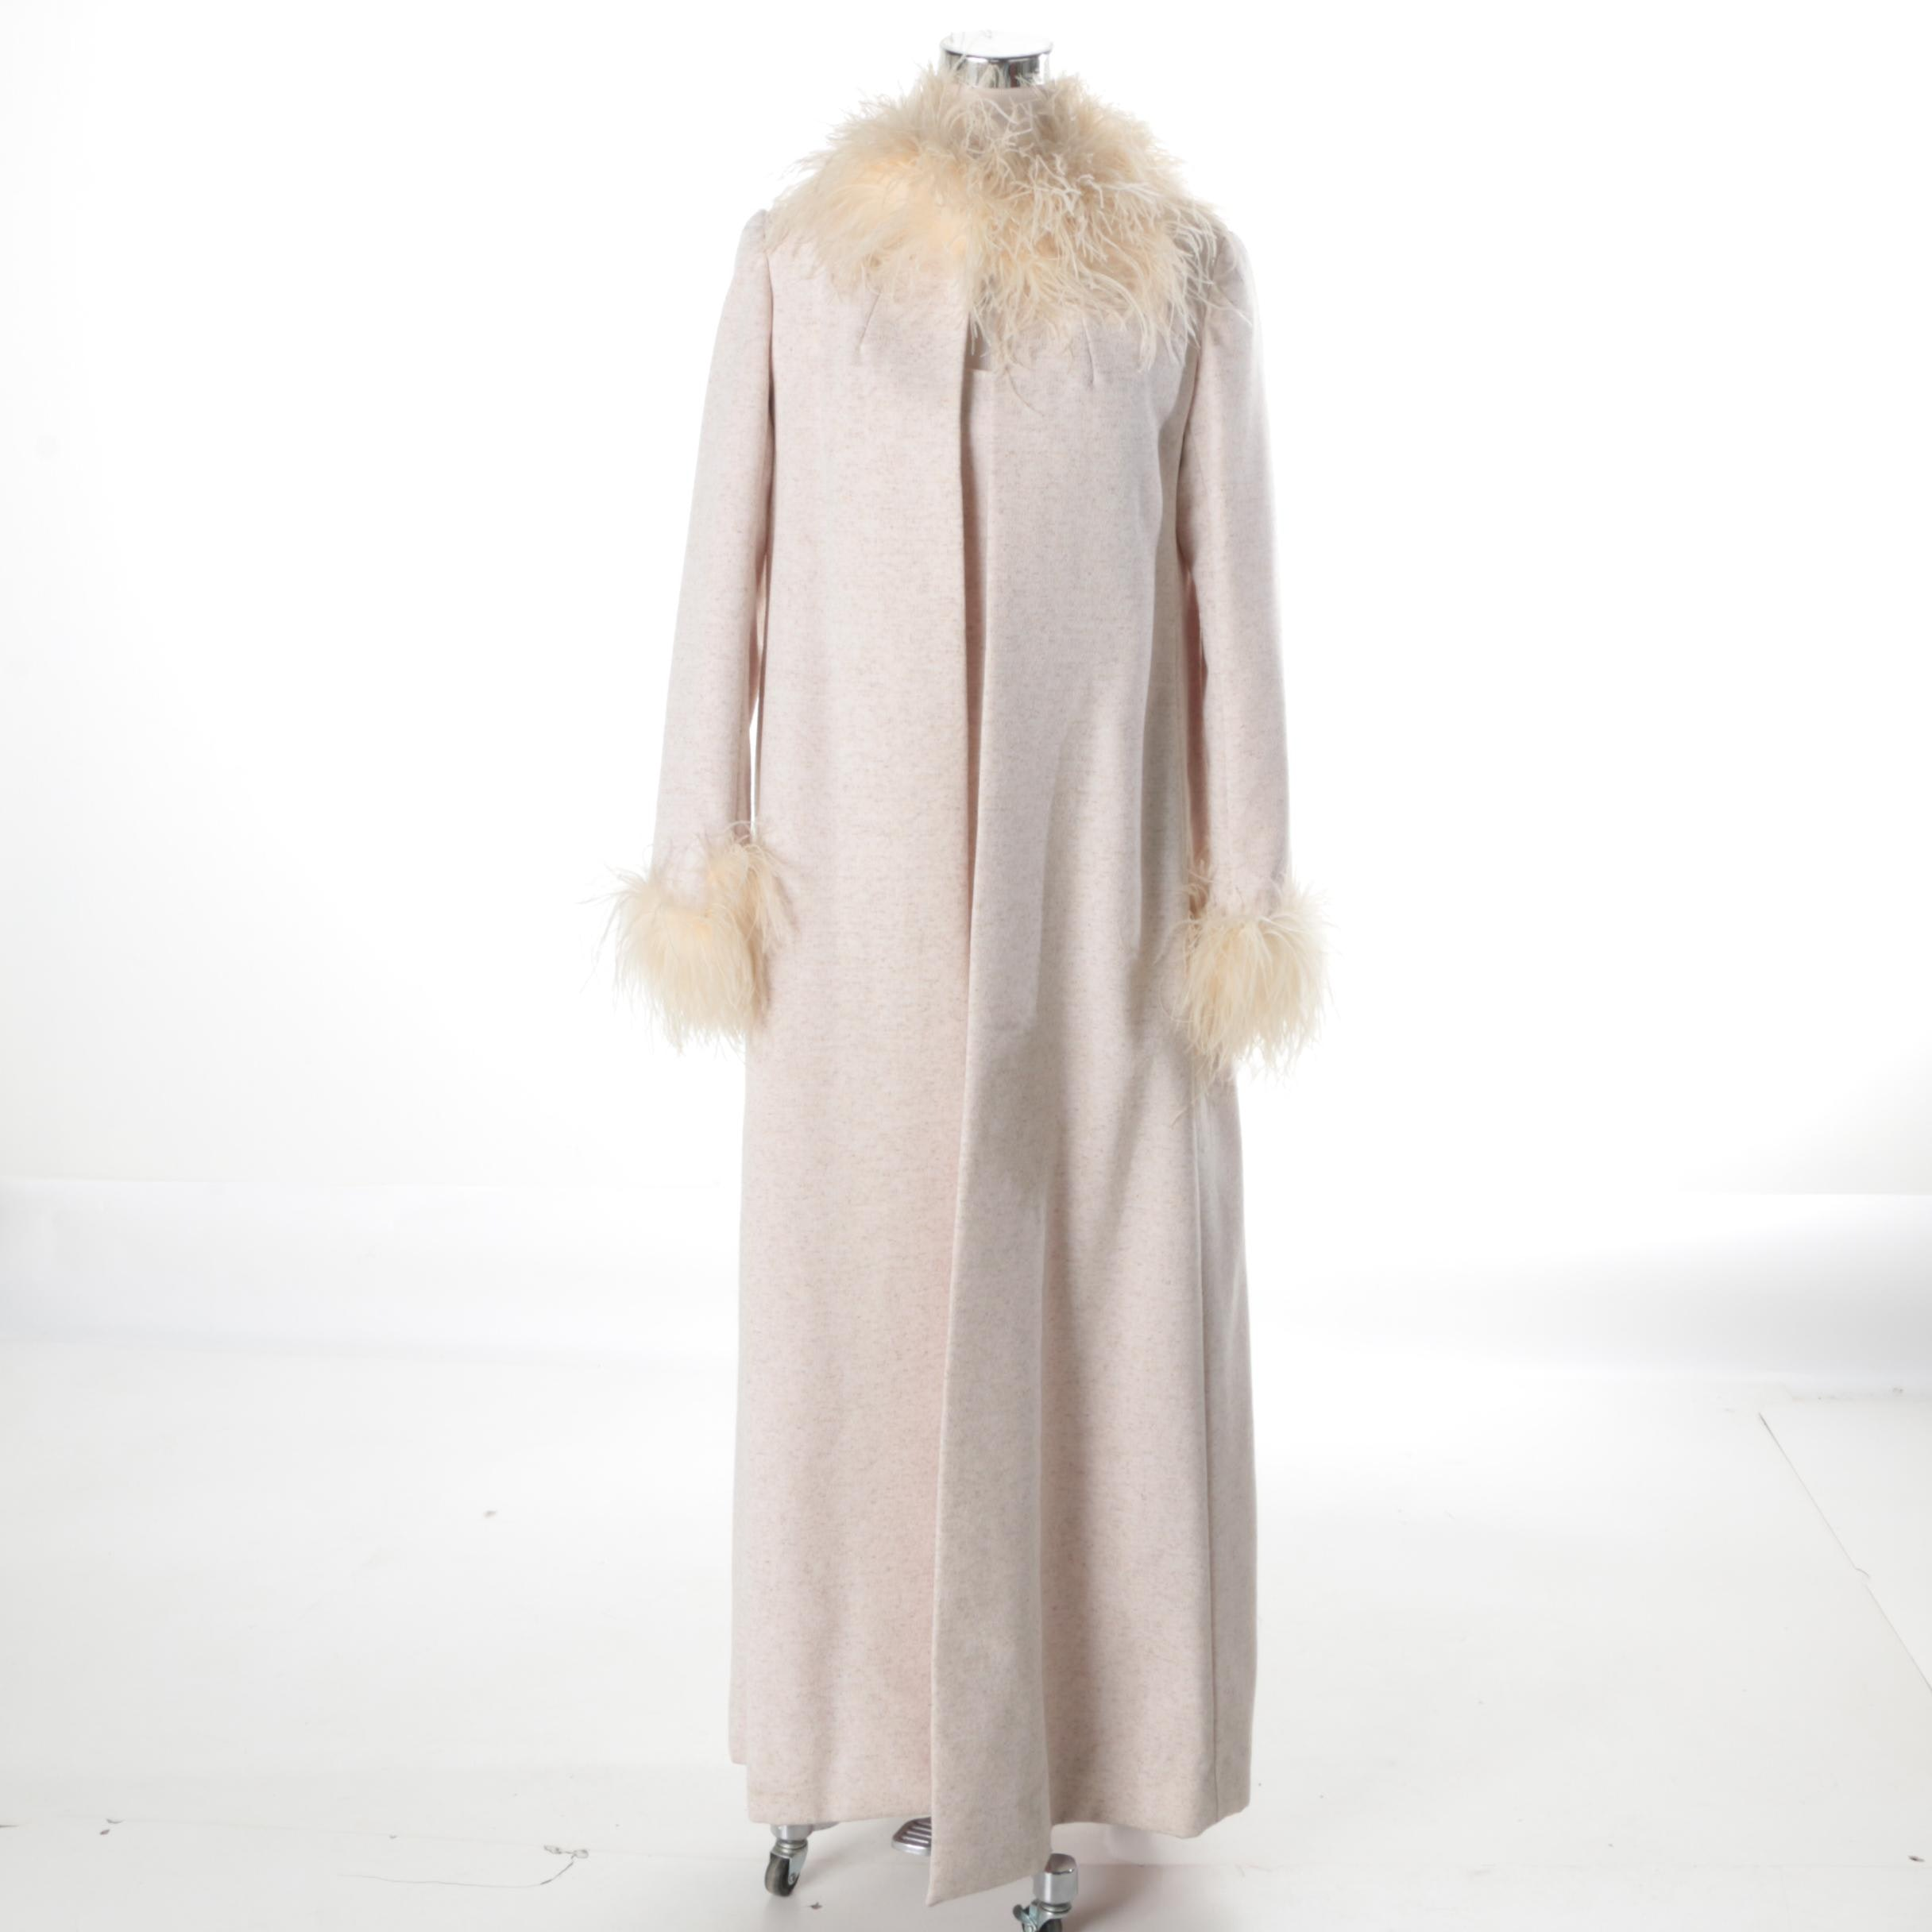 1960s Vogue Paris Original Dress and Overcoat